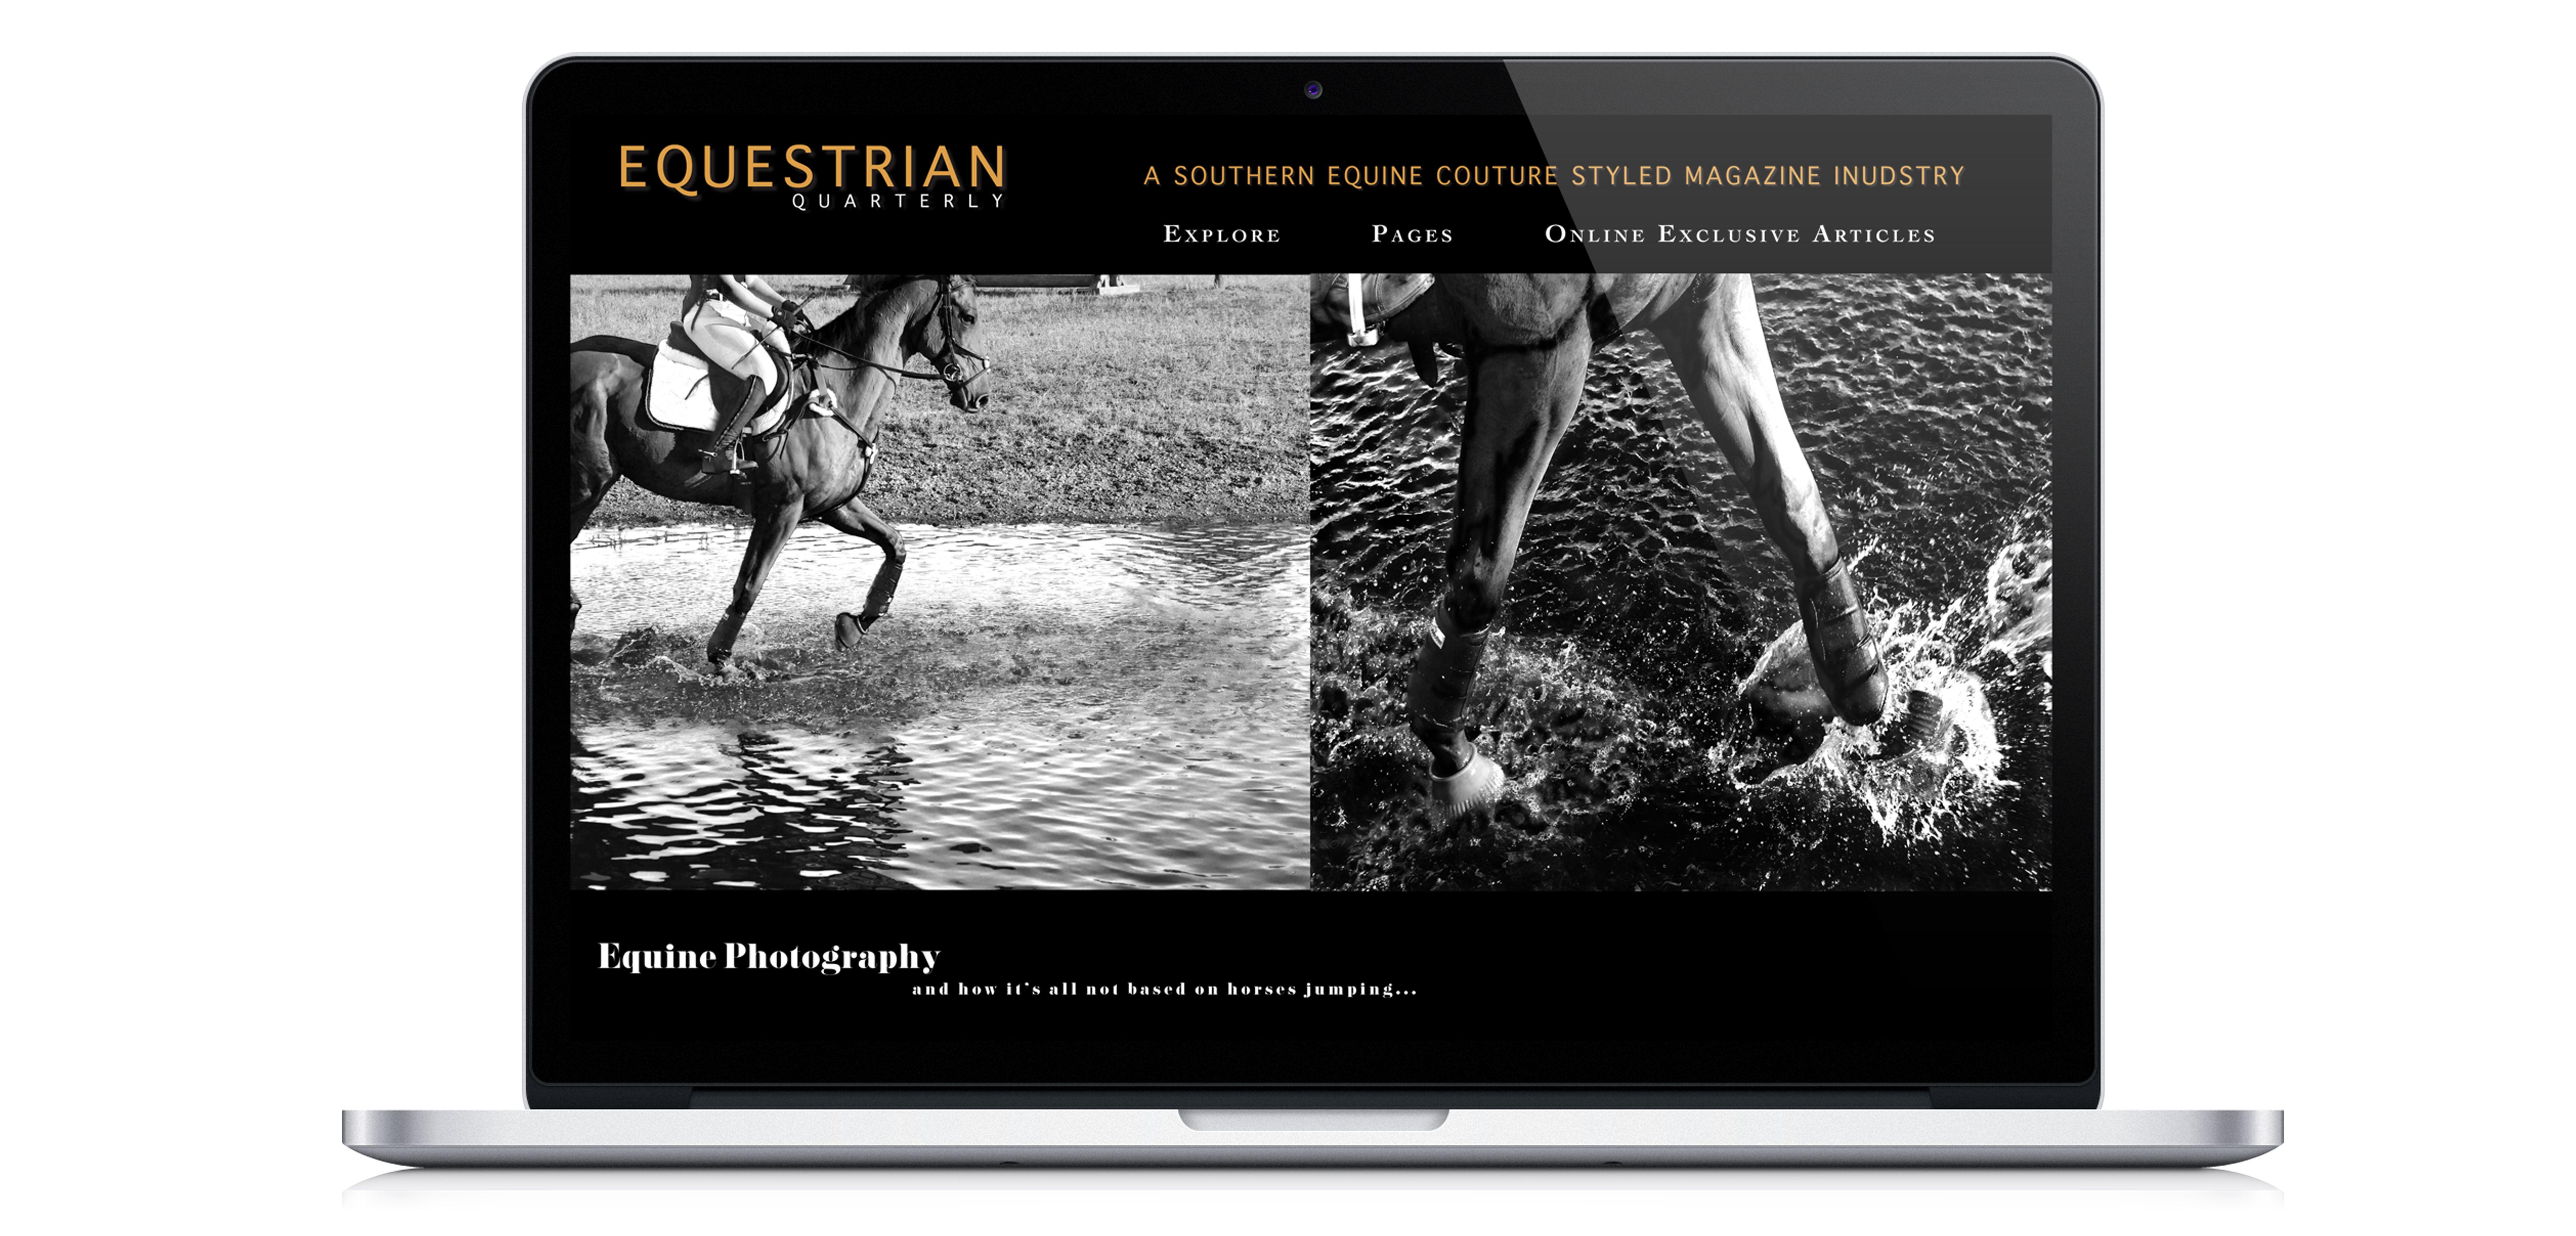 magazine layout online version designed by lindsey rowland